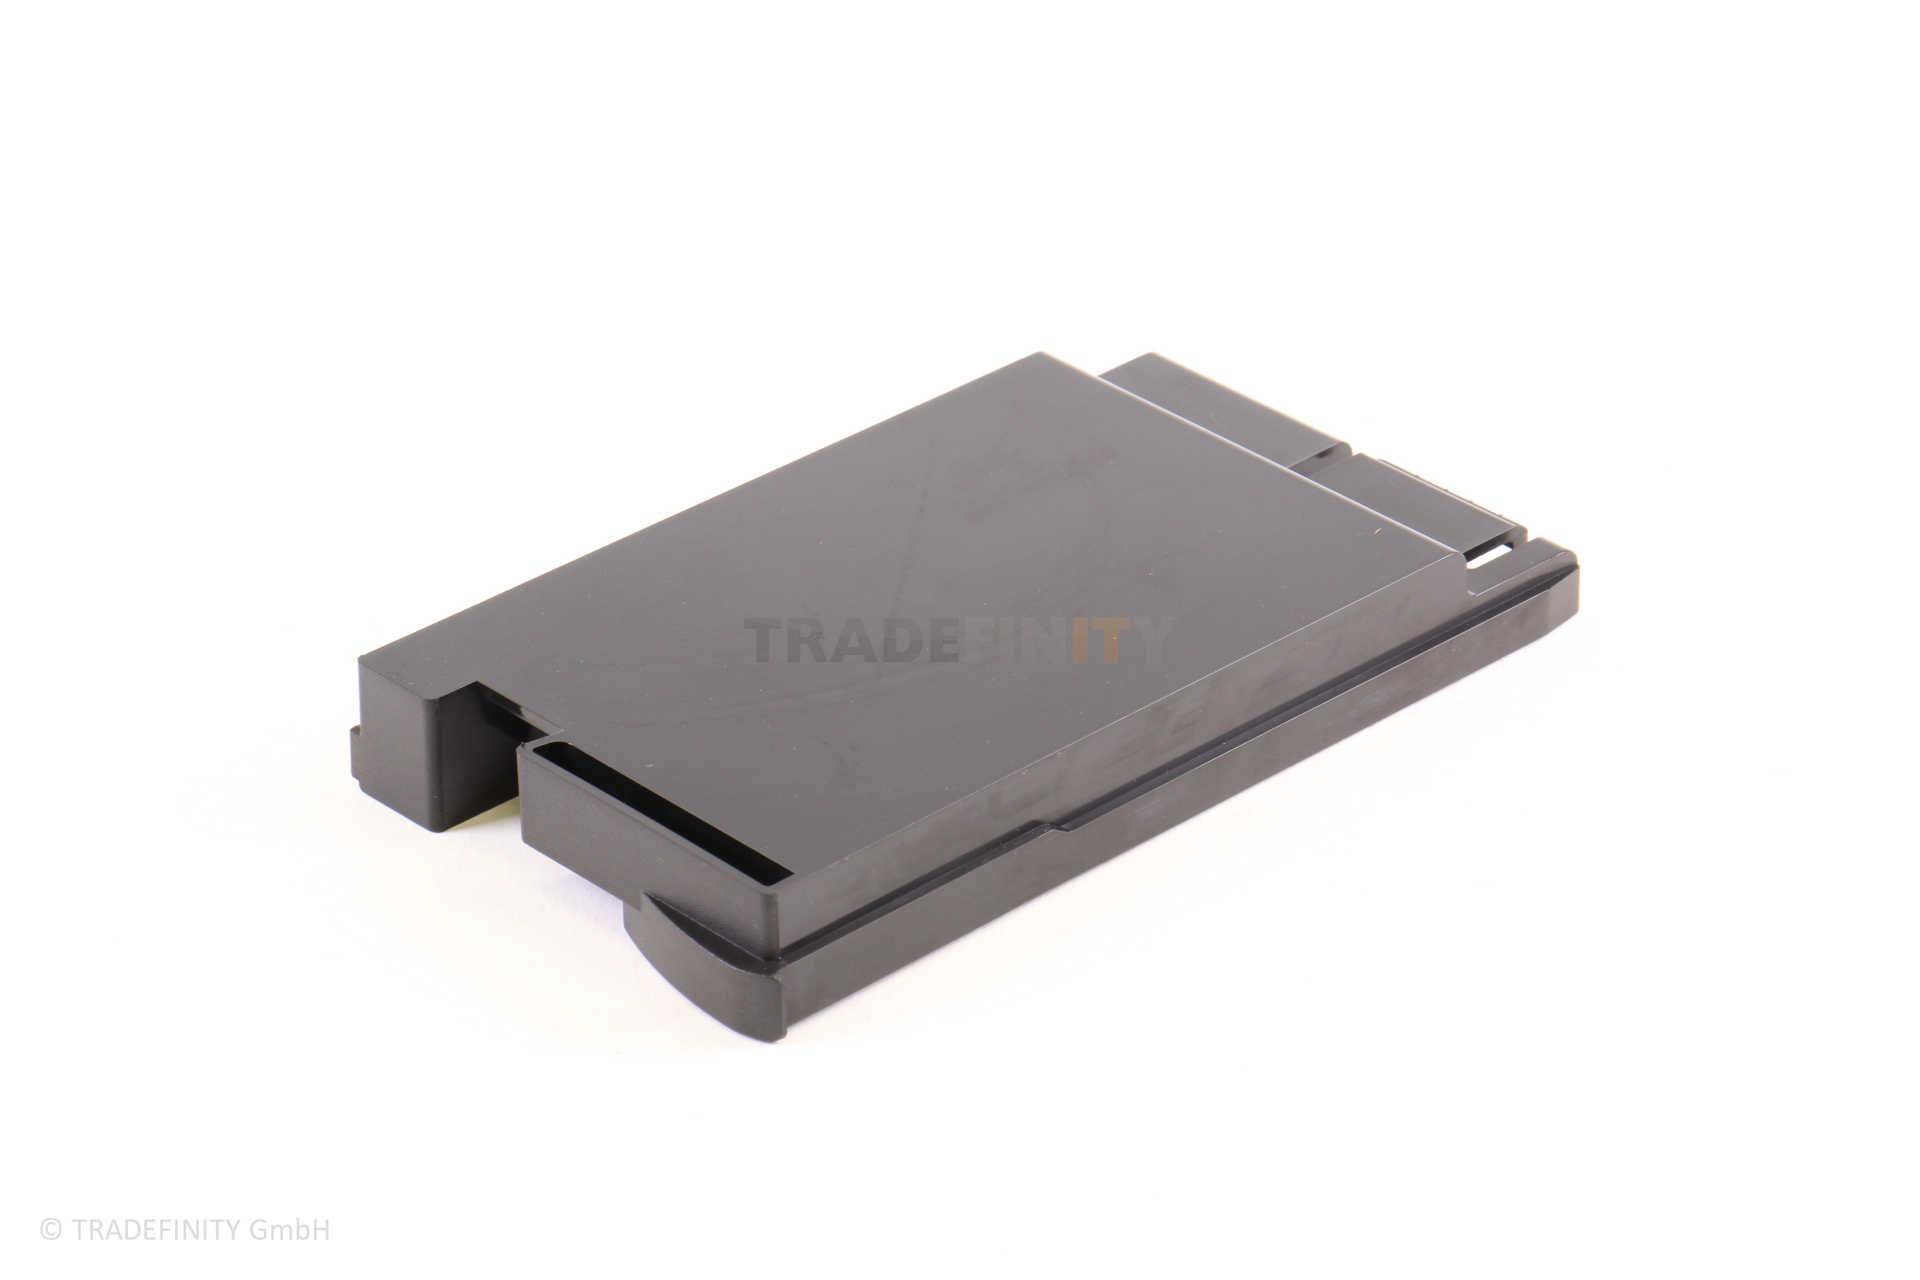 Disk Drive Filler (1 x Filler)